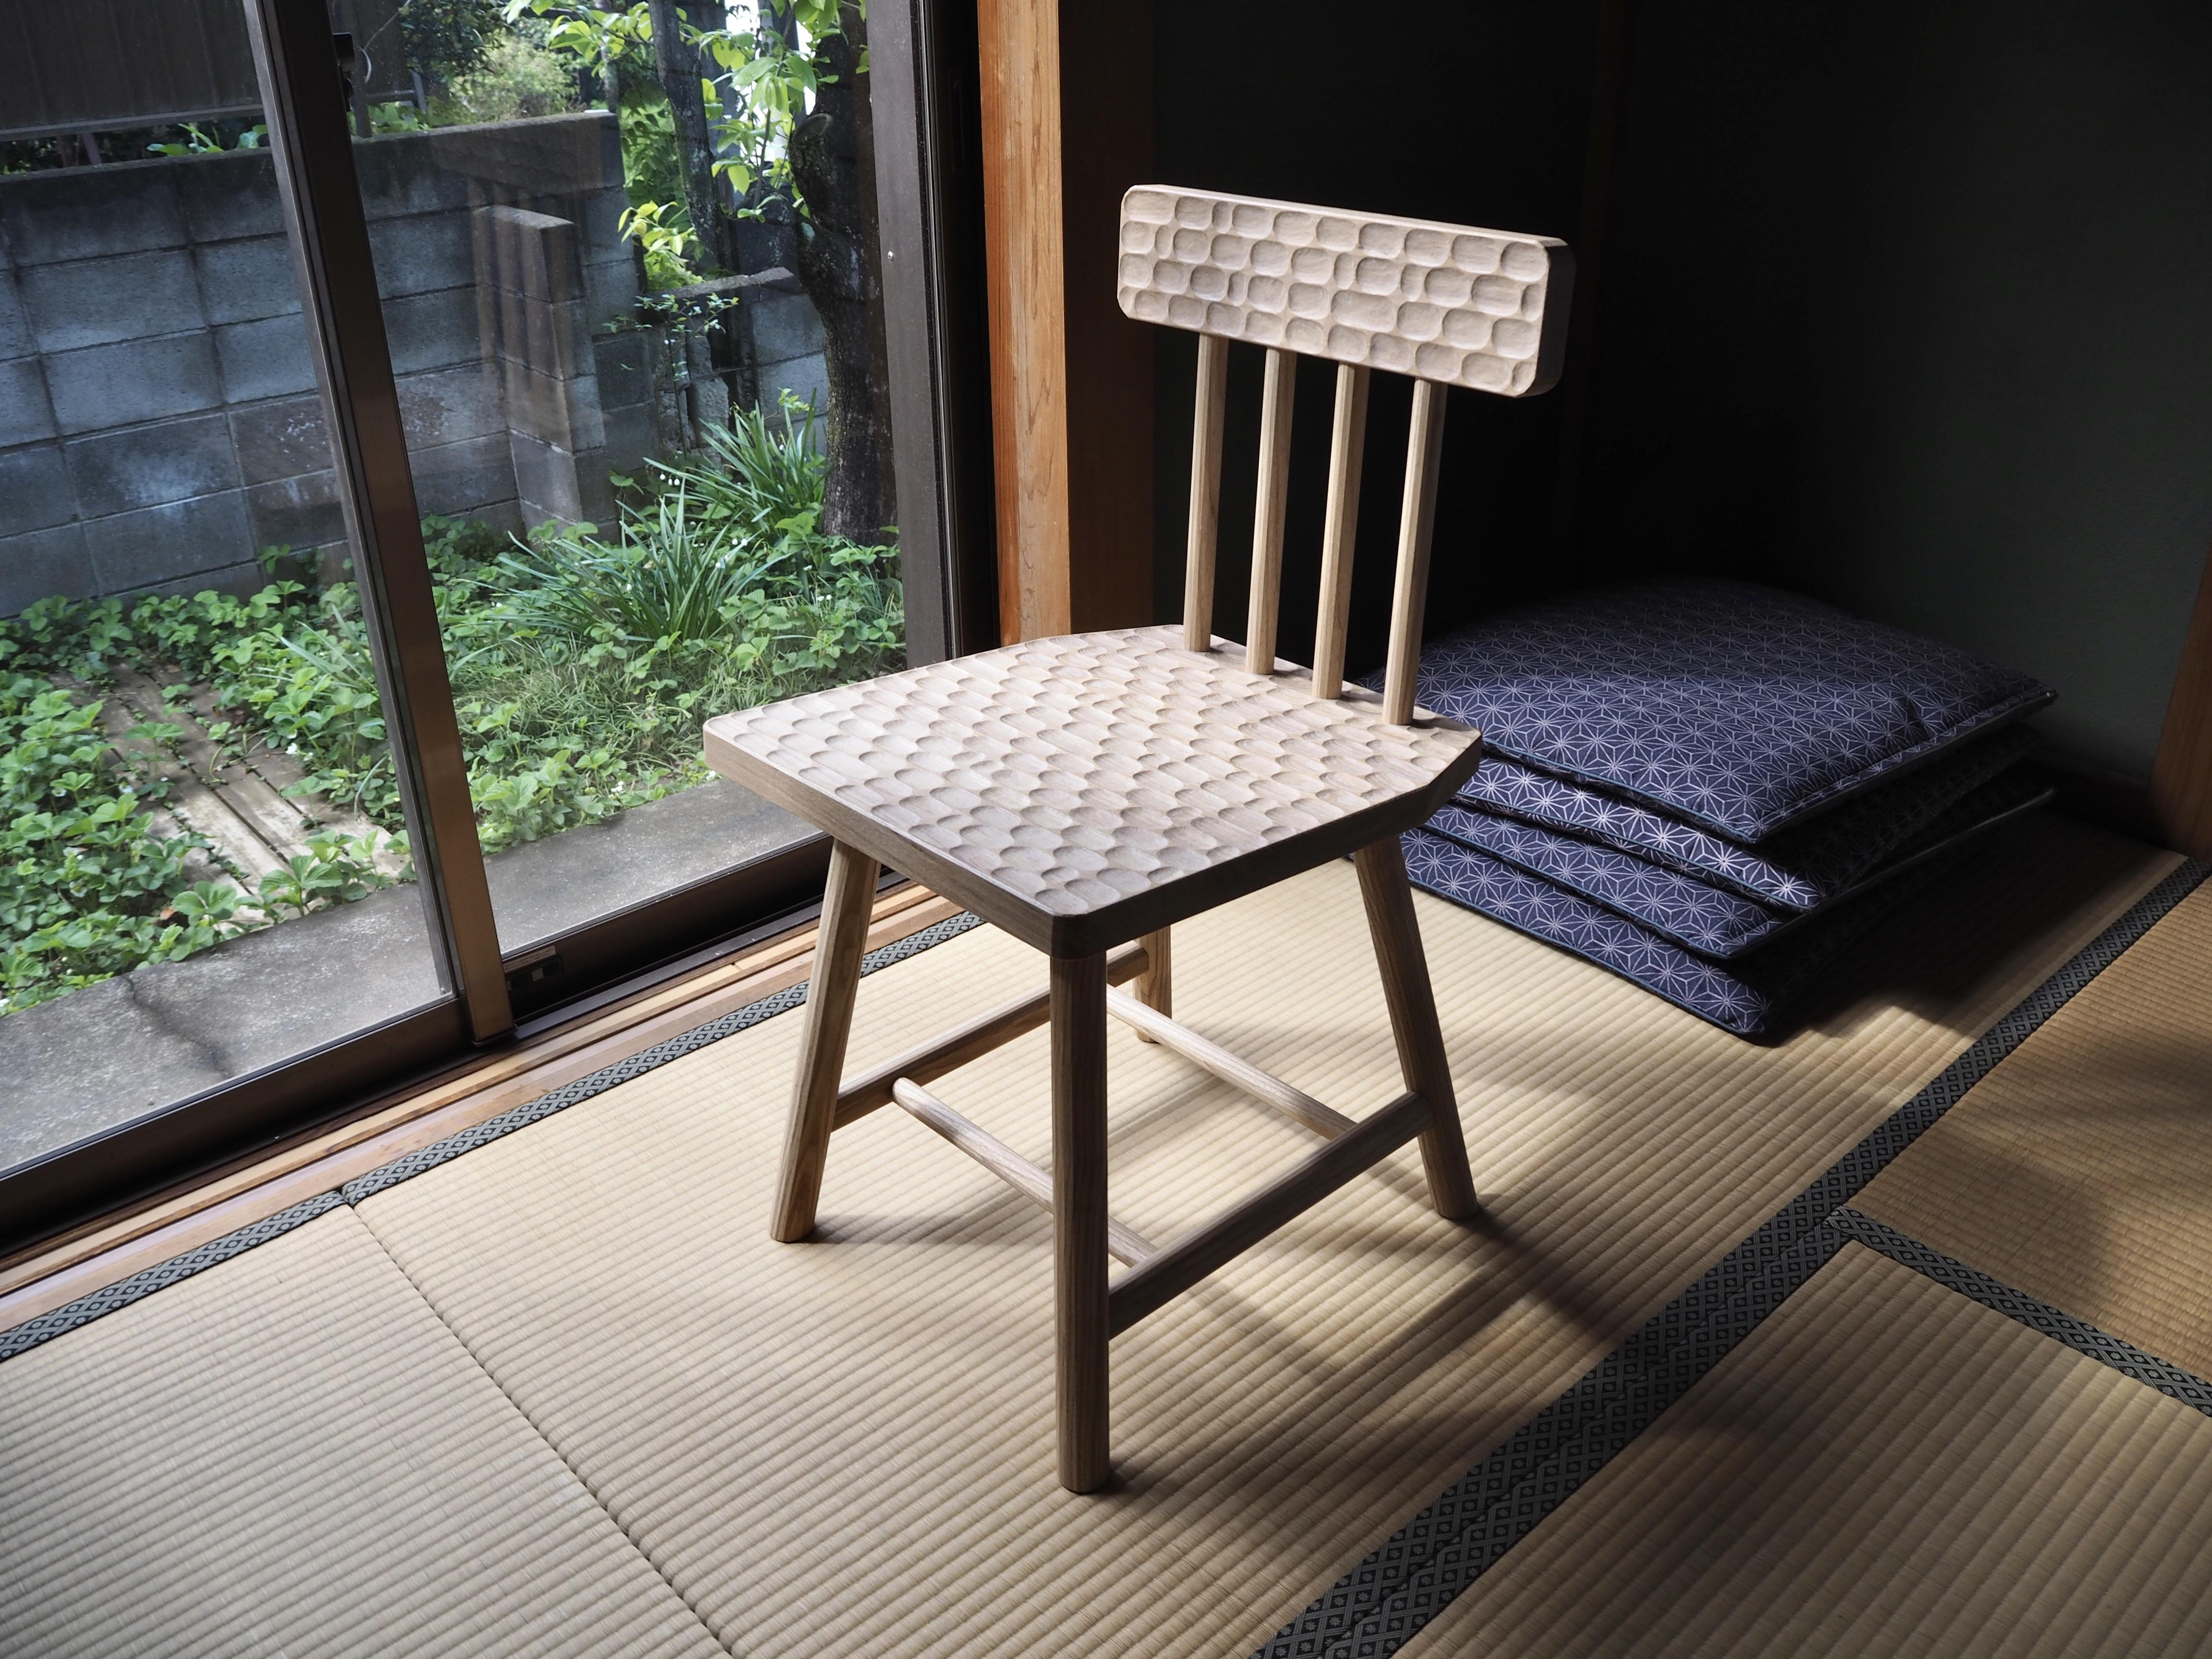 Single chair edition of the 親指 Oyayubi bench